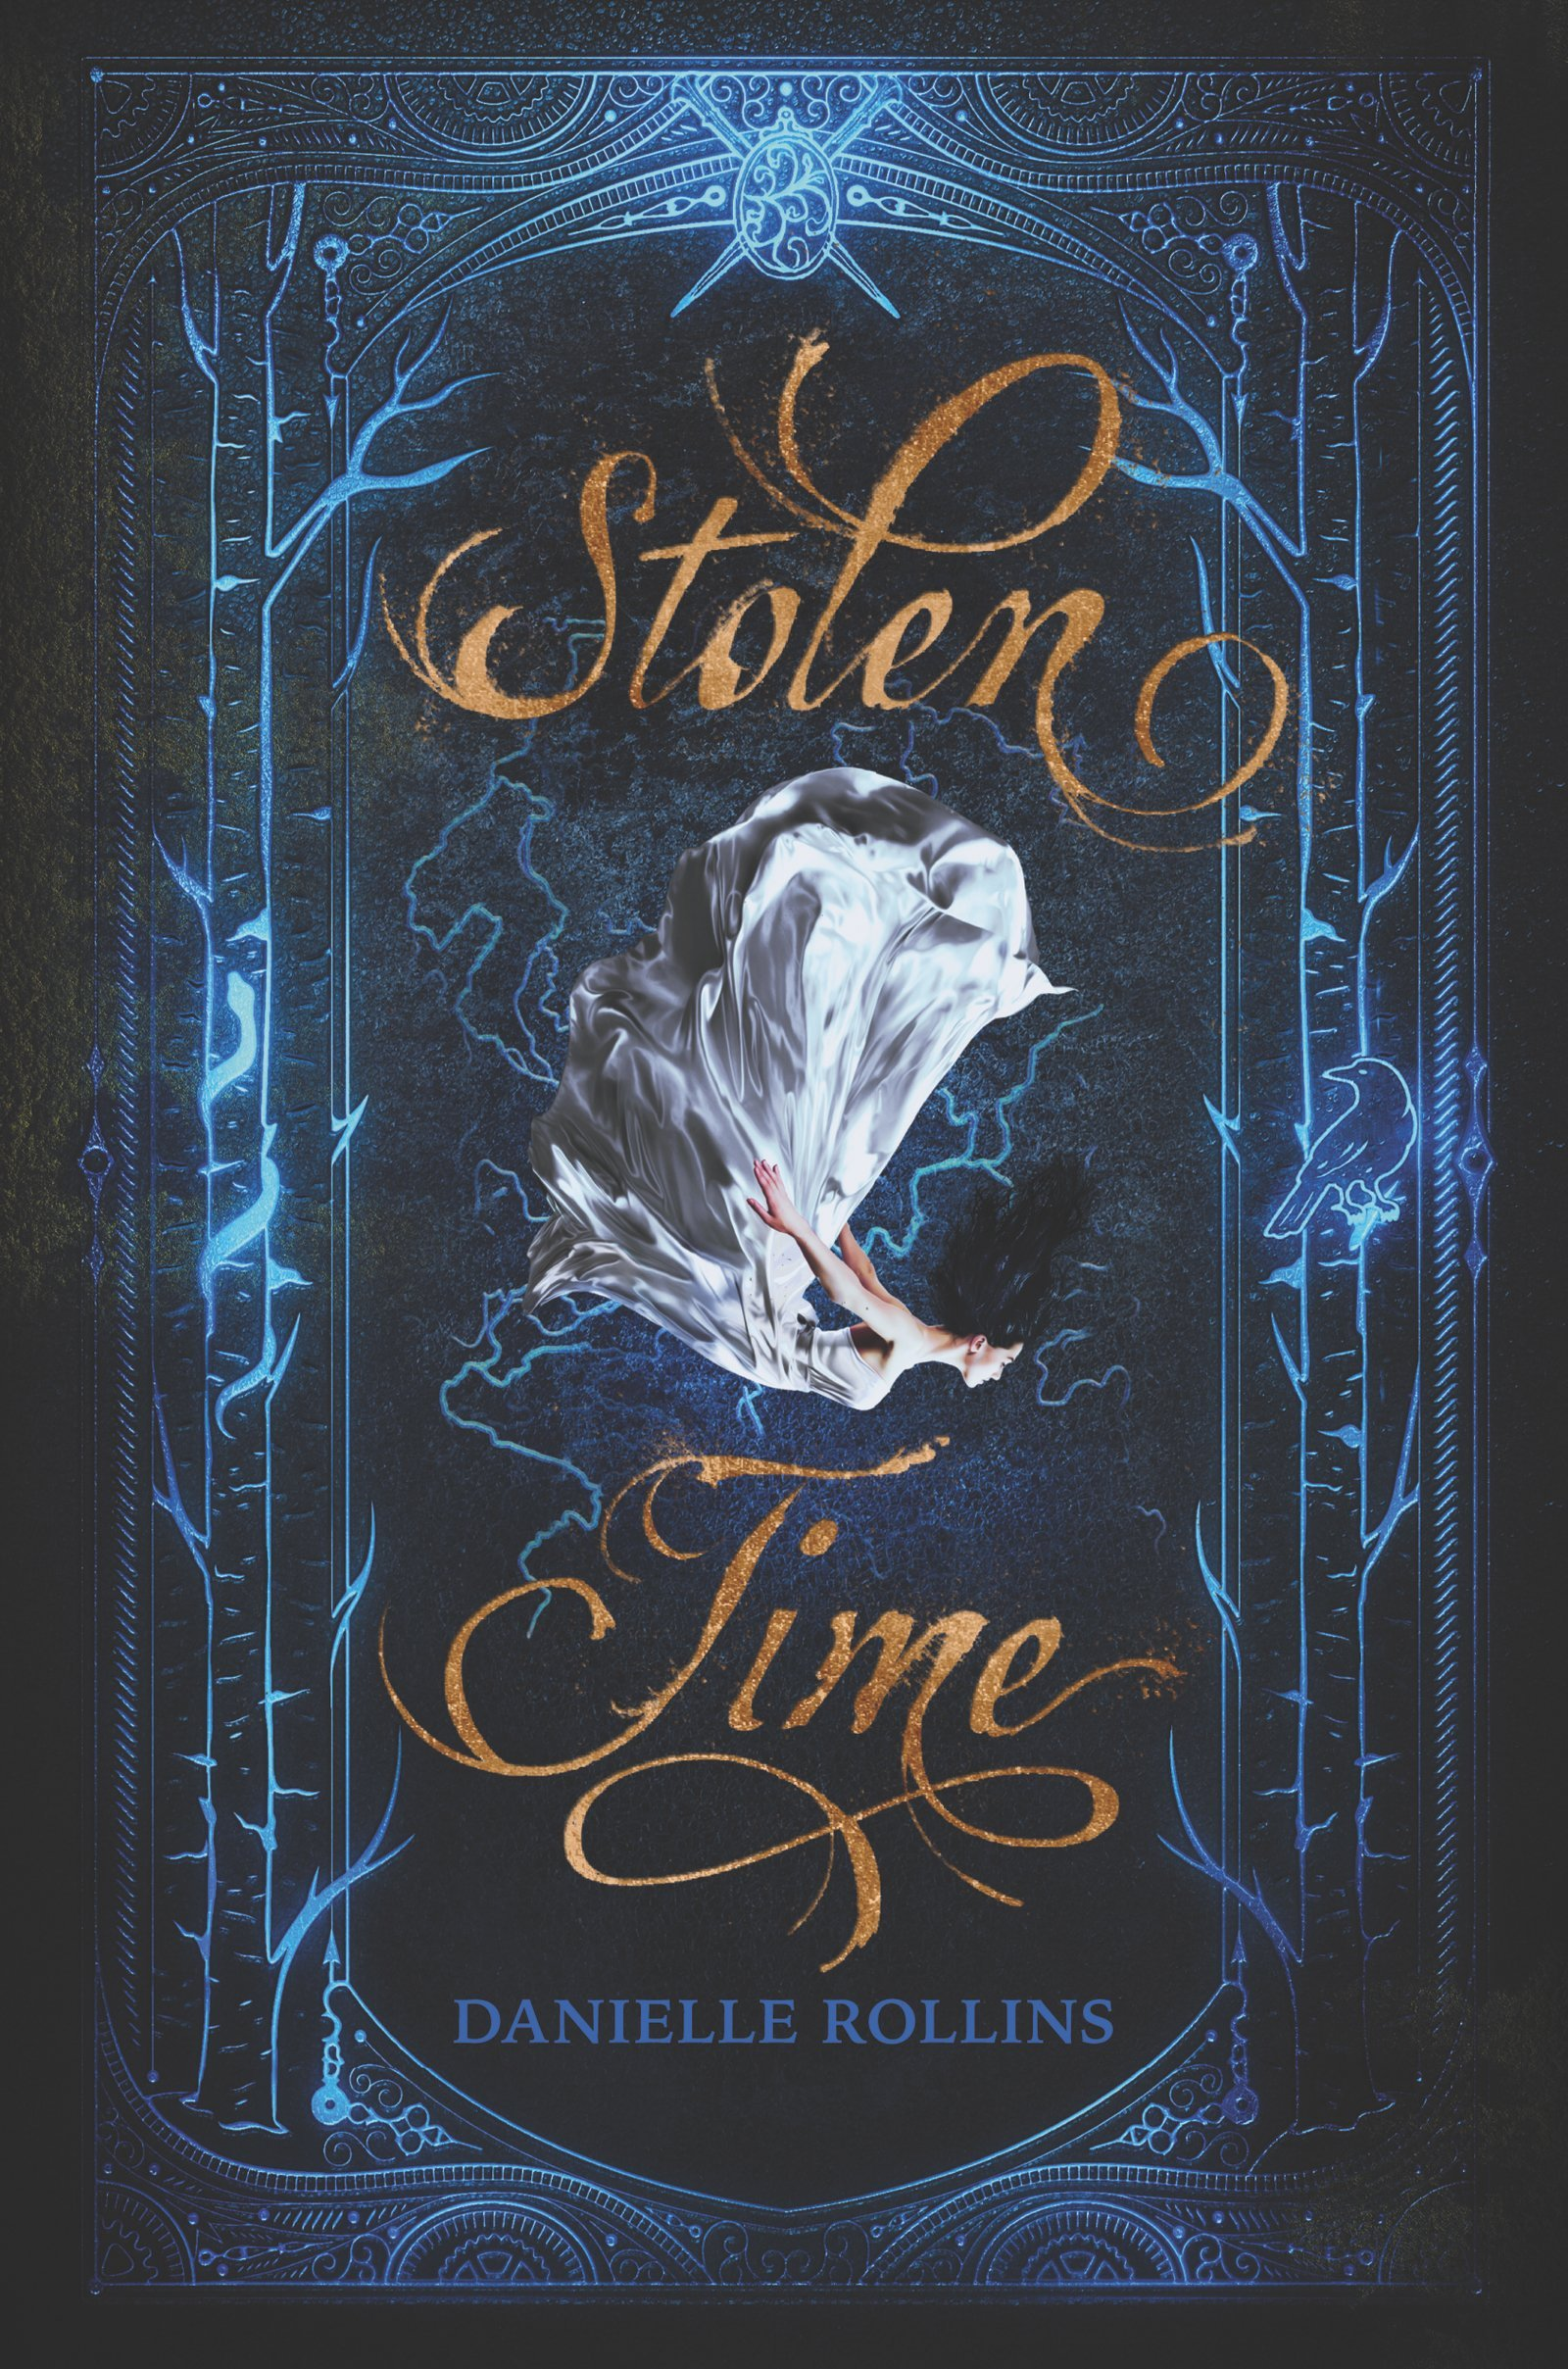 Amazon.com: Stolen Time (Dark Stars) (9780062679949): Rollins, Danielle: Books